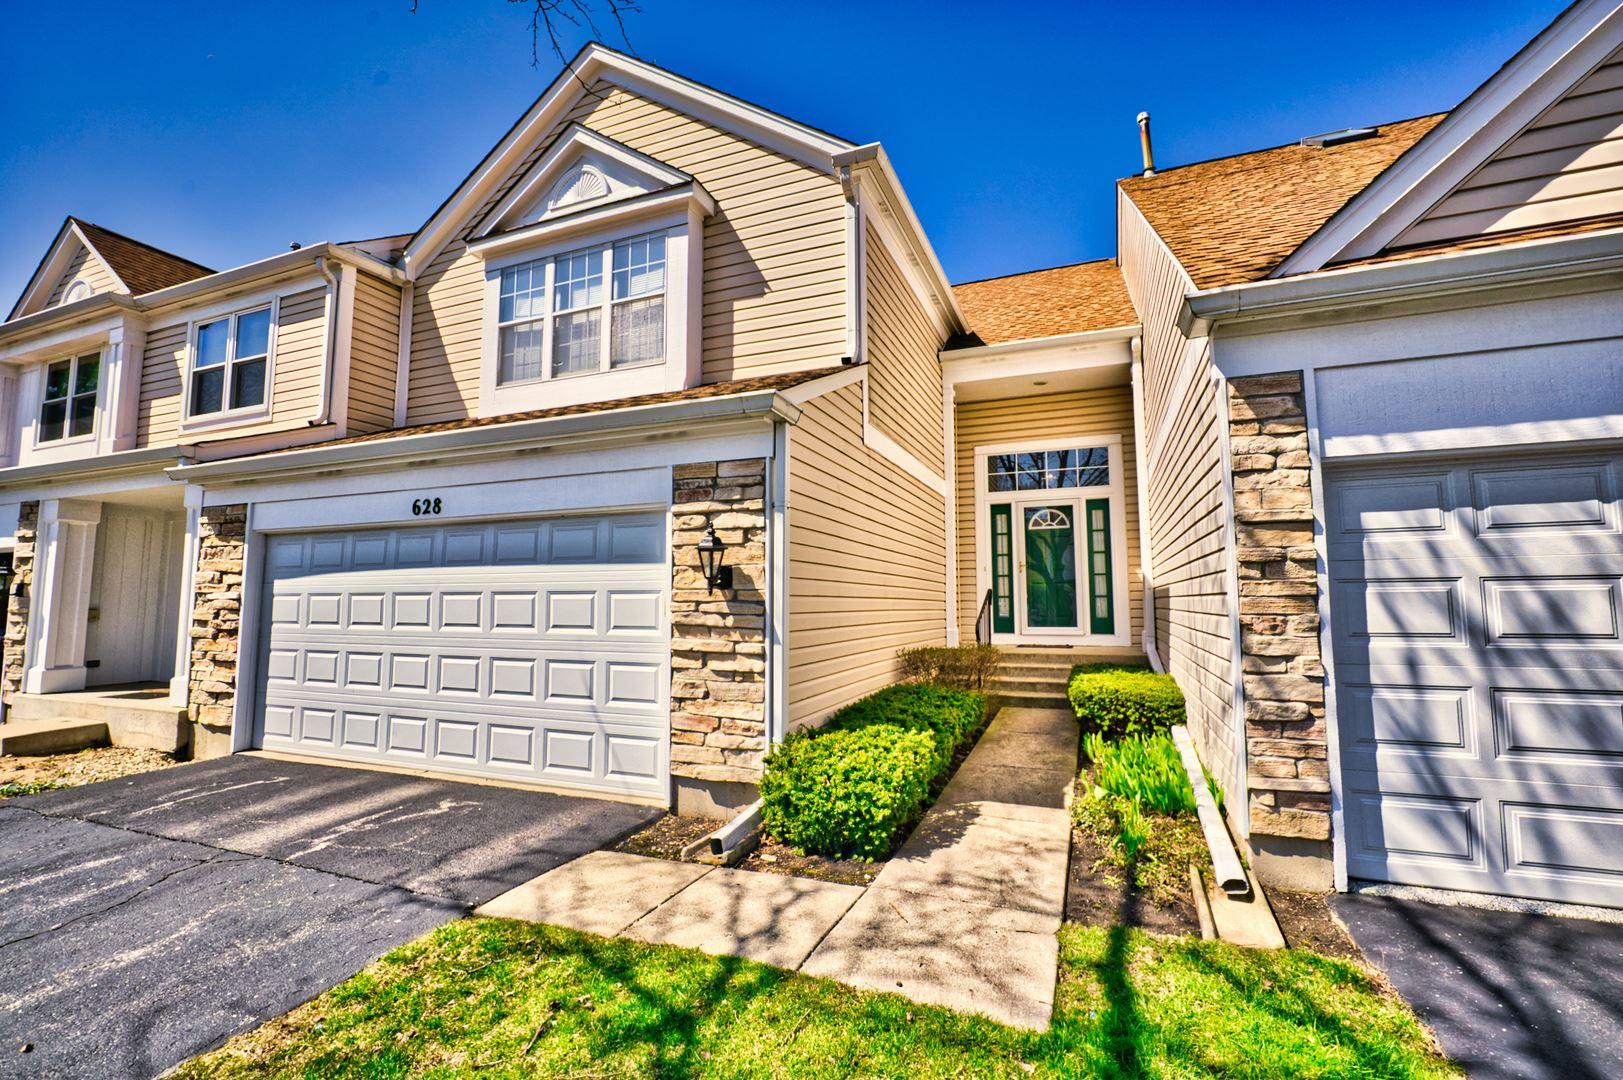 628 N CHARTER HALL Drive, Palatine, IL 60067 - #: 10693245